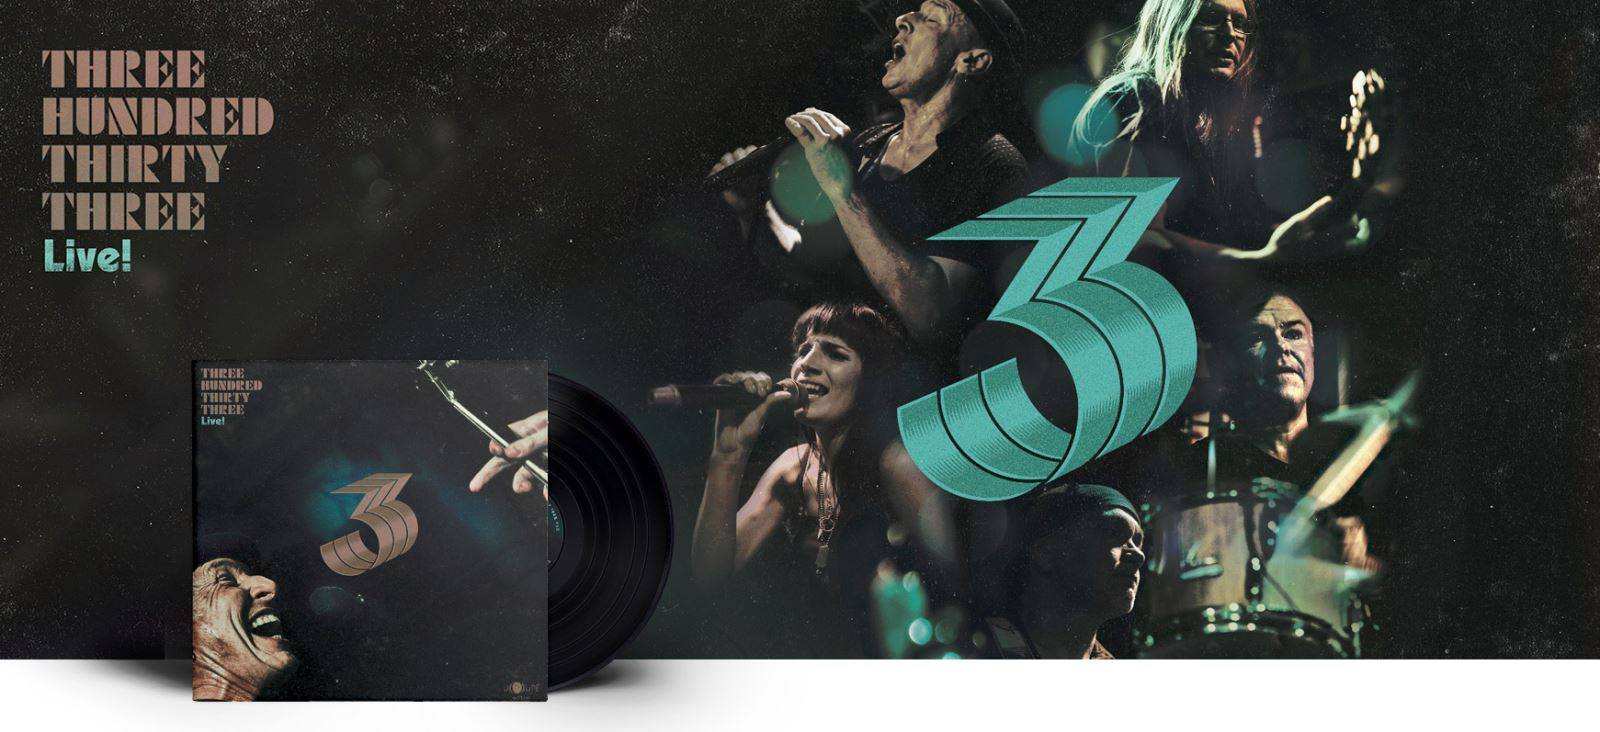 333 - Live!